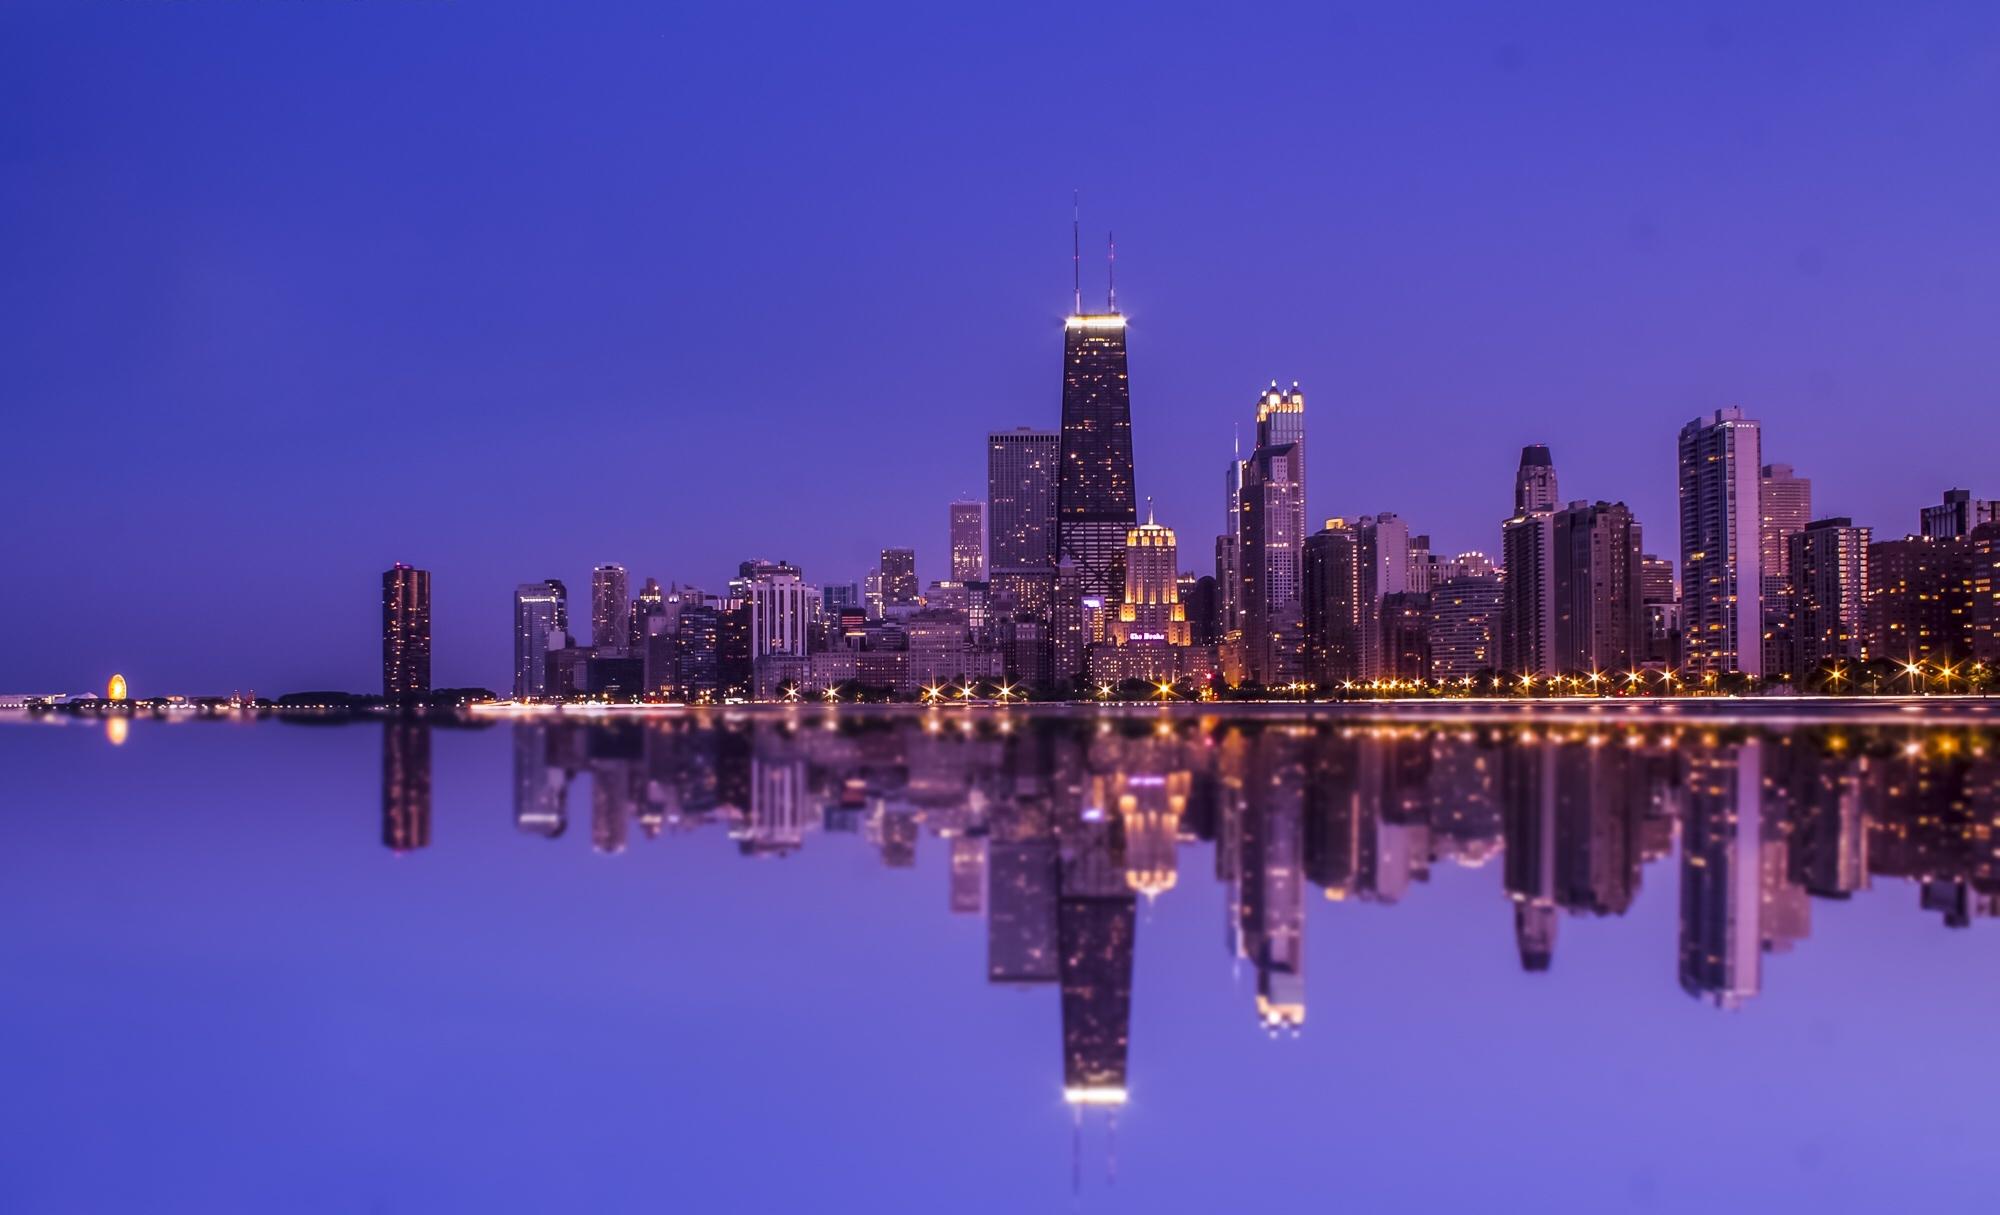 Building Chicago City Night Reflection Skyscraper Usa 2000x1215